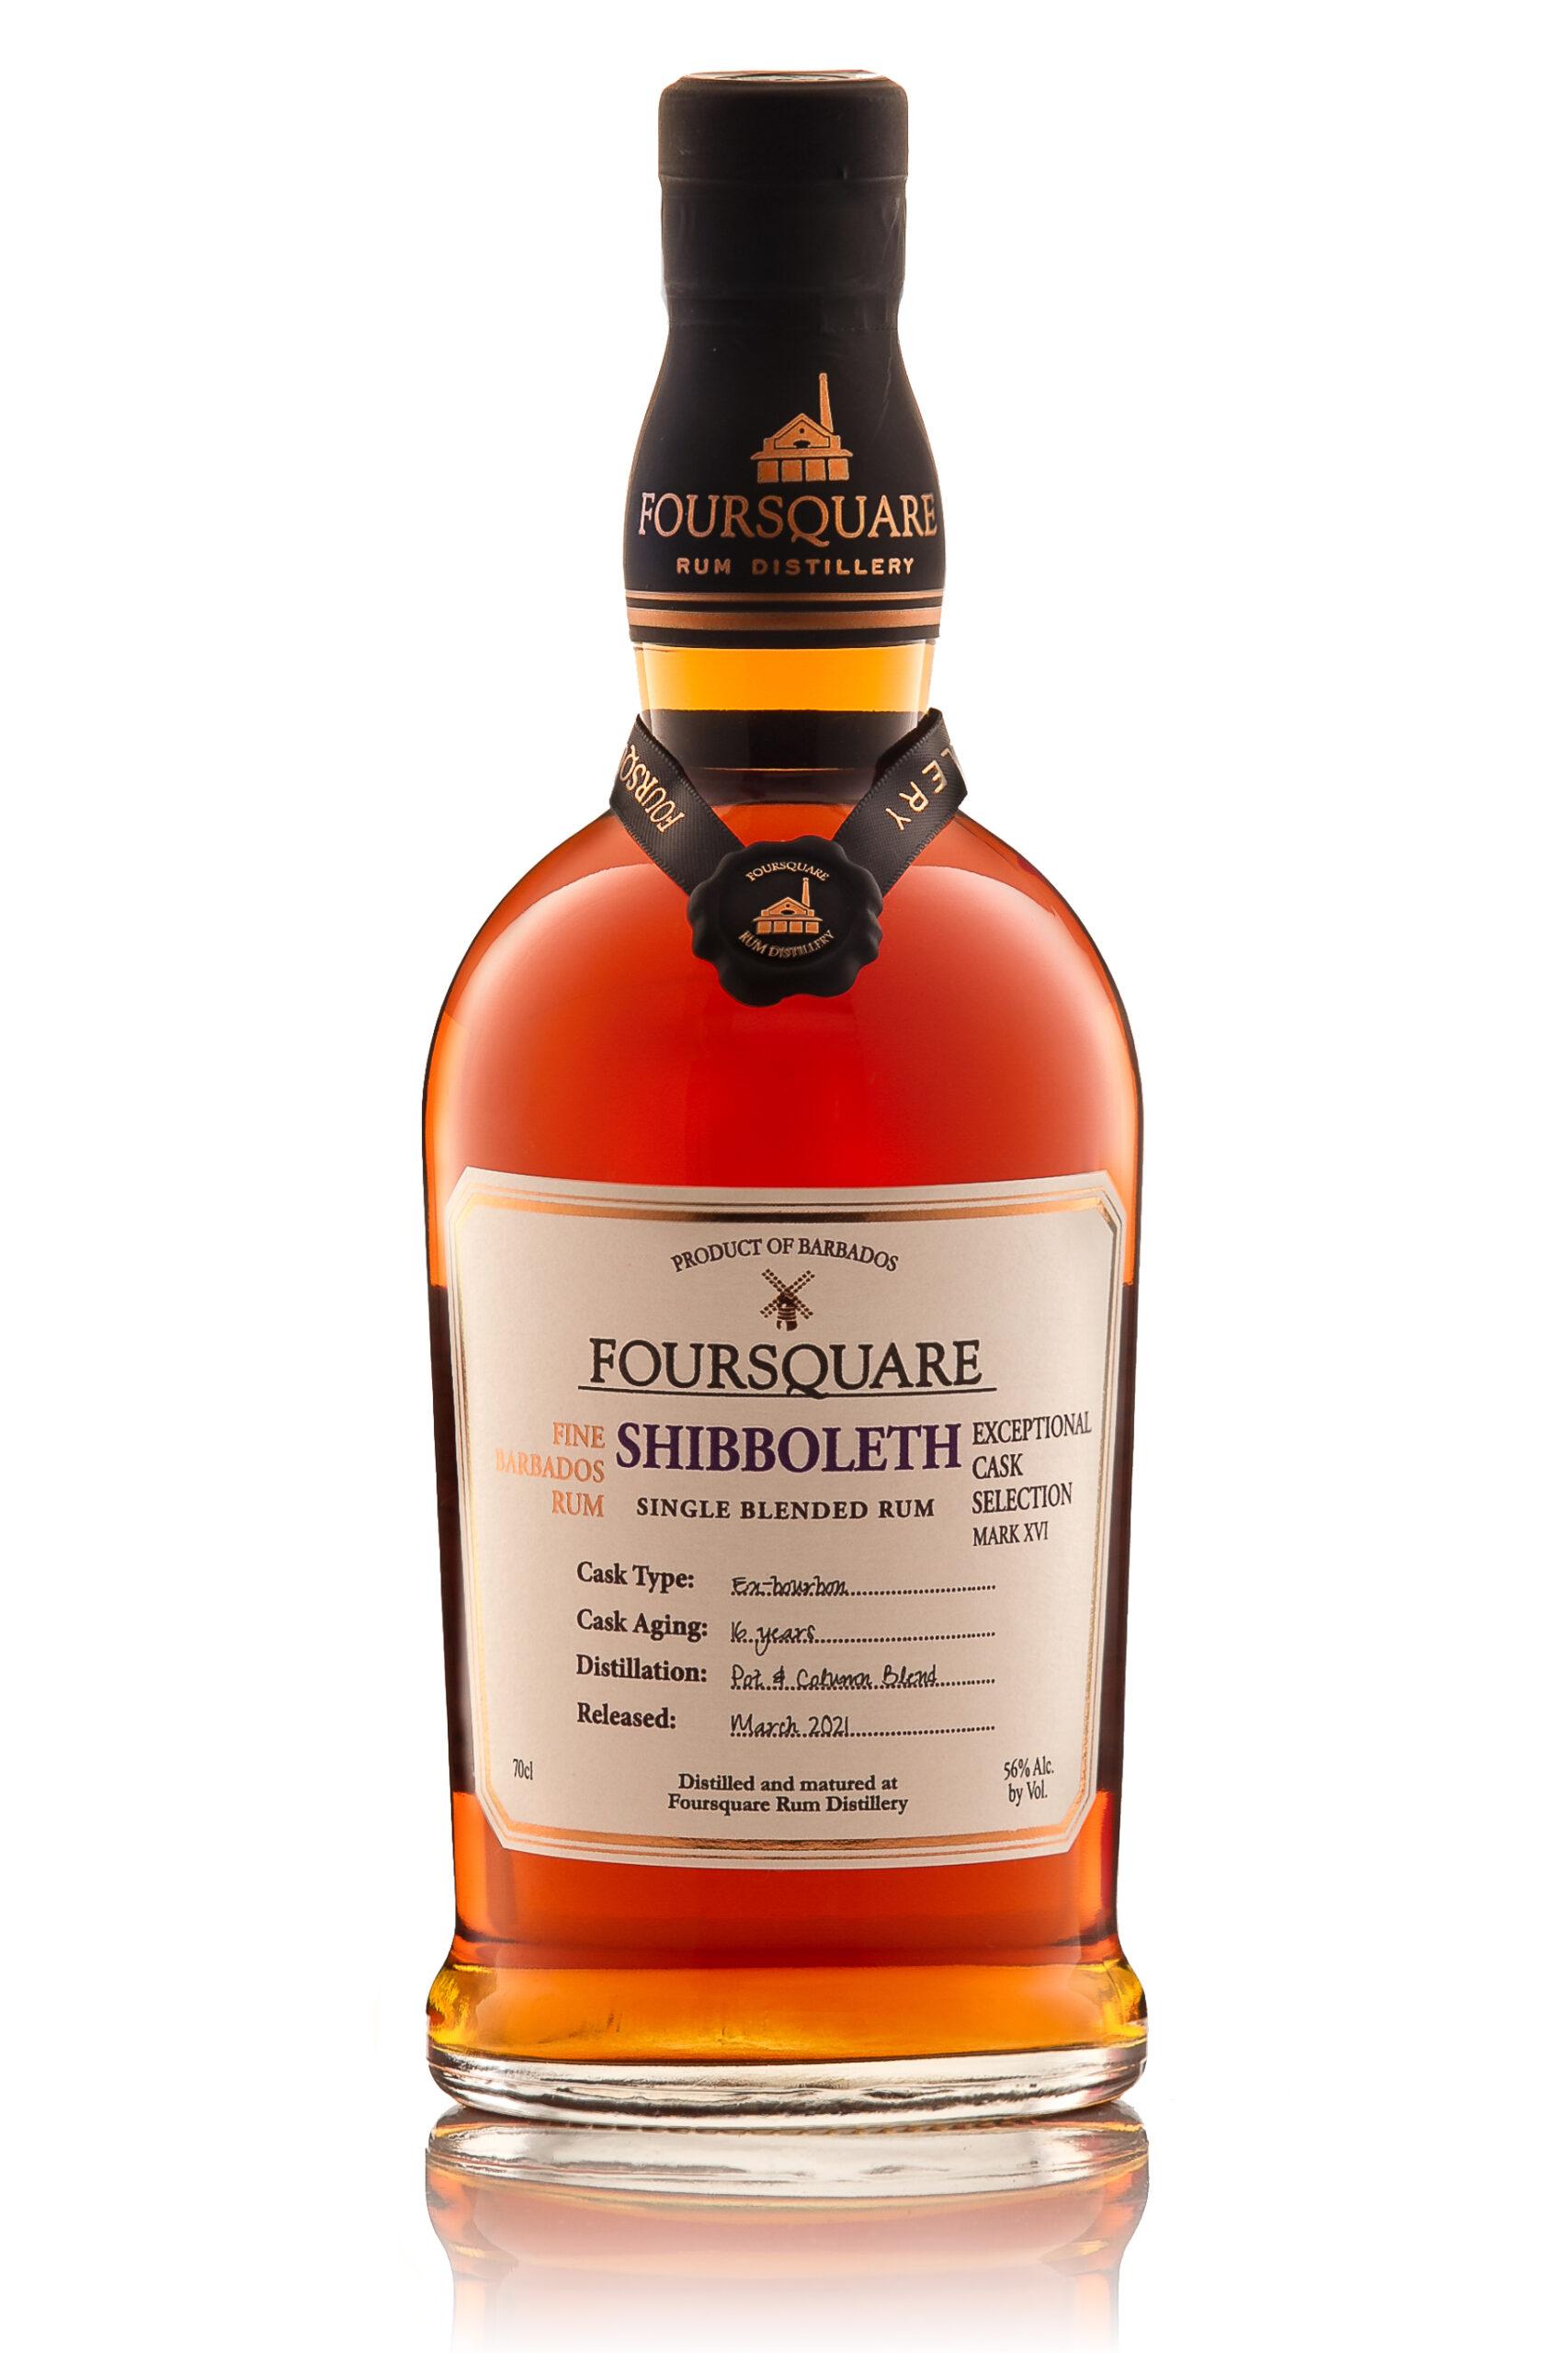 Foursquare Shibboleth rum